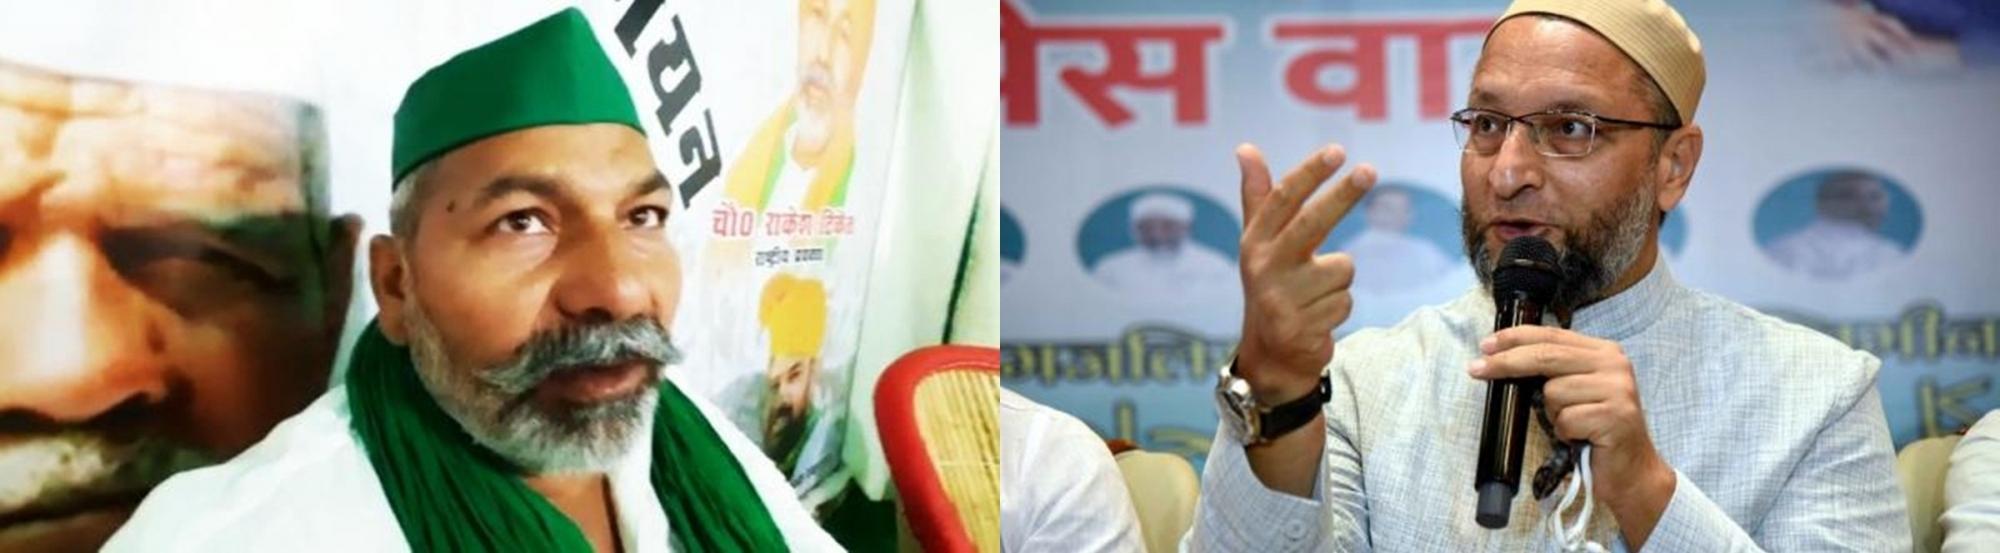 Now, Rakesh Tikait calls Owaisi 'chacha jaan'